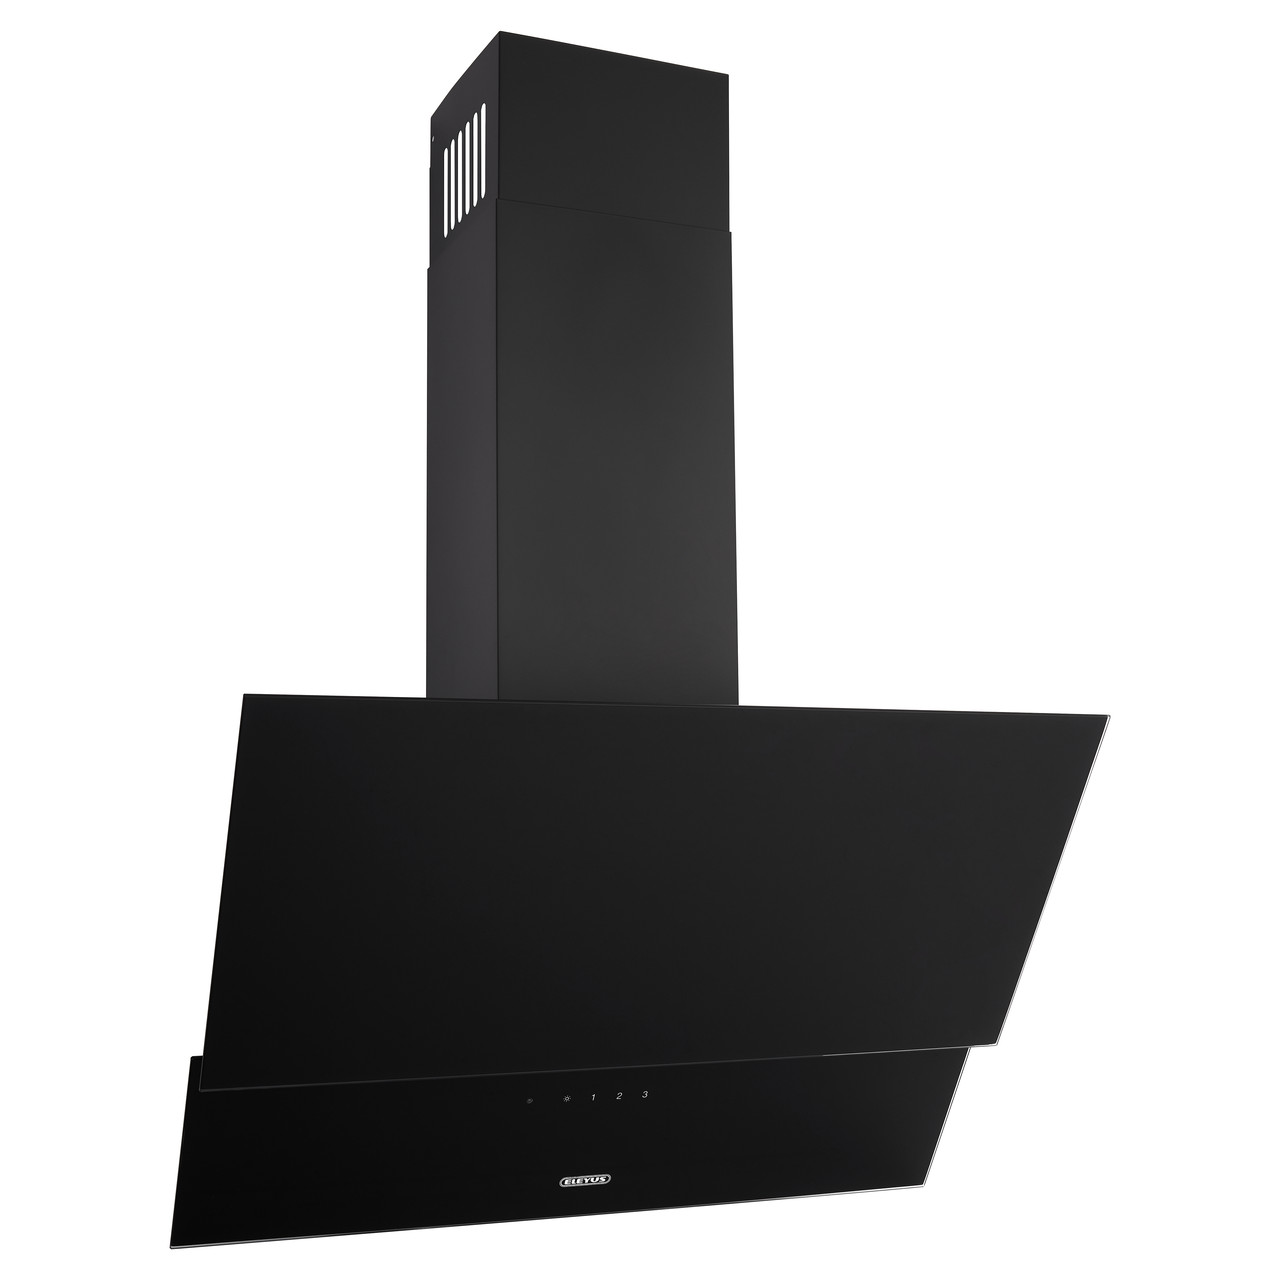 Витяжка кухонна вертикальна ELEYUS Element 1000 60 BL + Безкоштовна доставка!